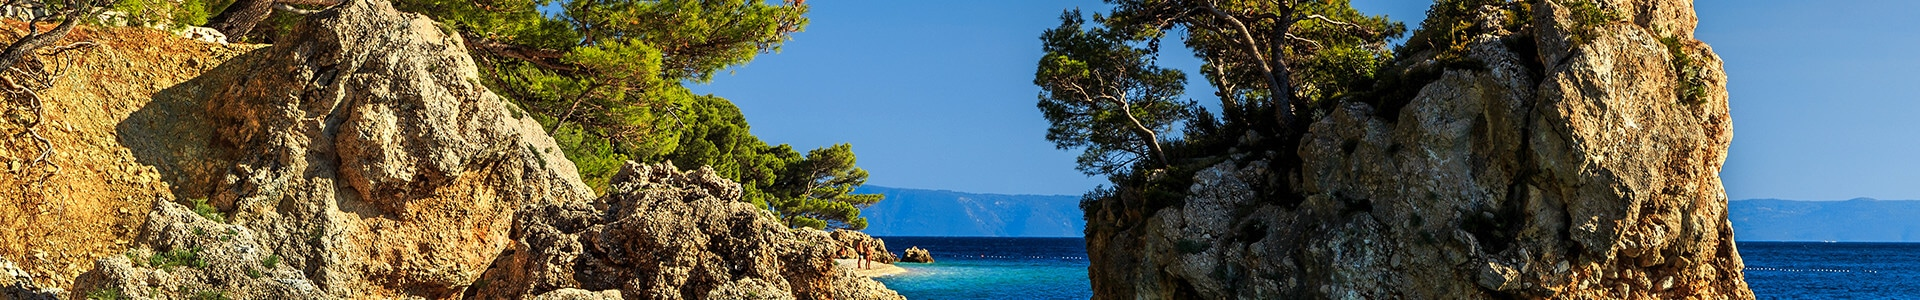 Voyage Iles croates - TUI